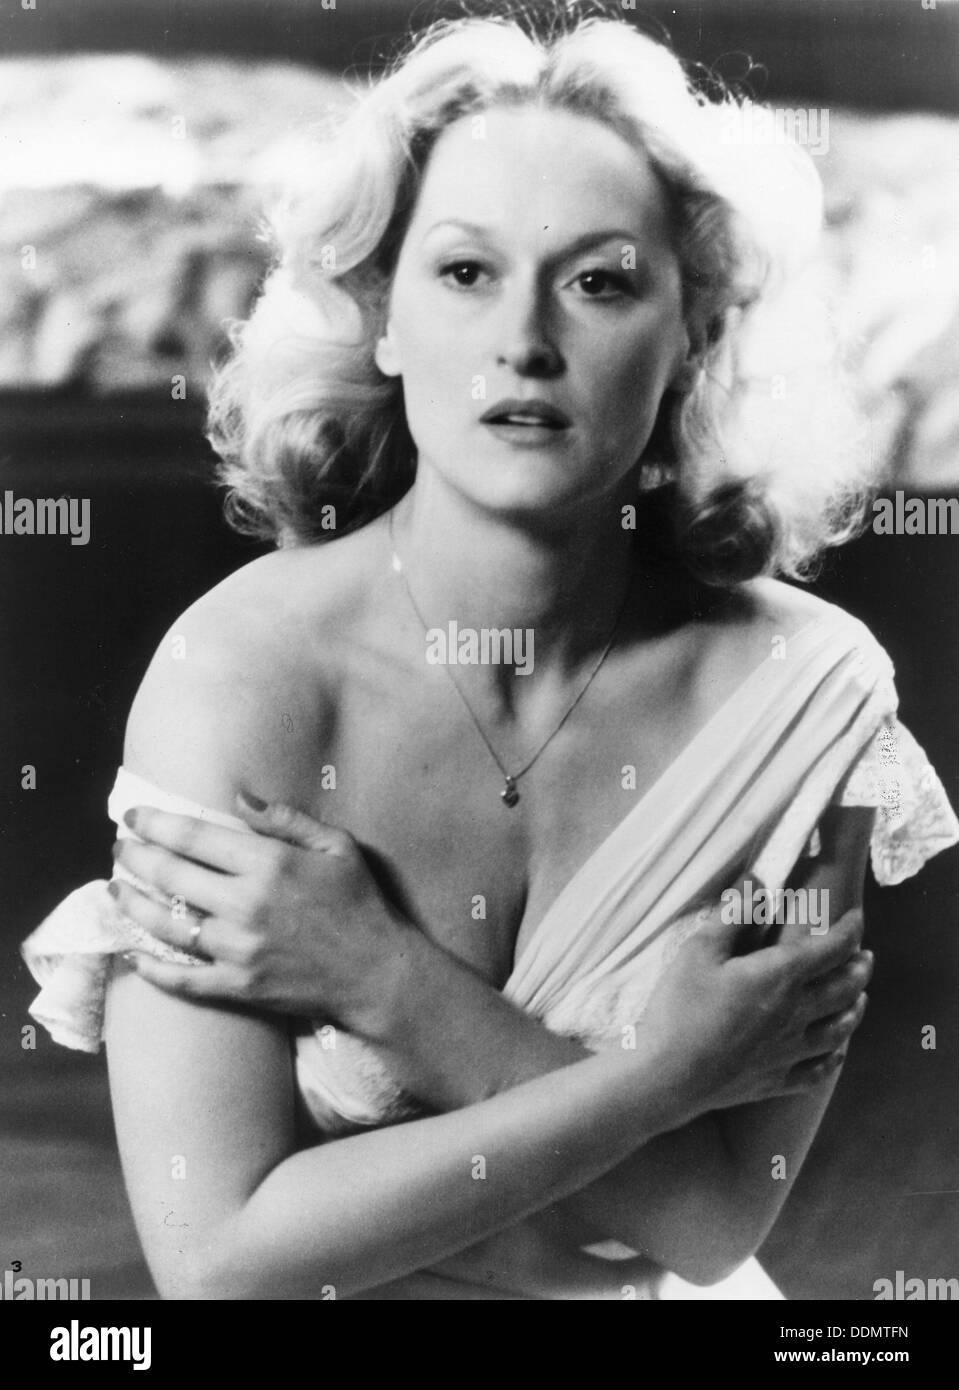 Meryl Streep (1949-), American actress, 1983. - Stock Image